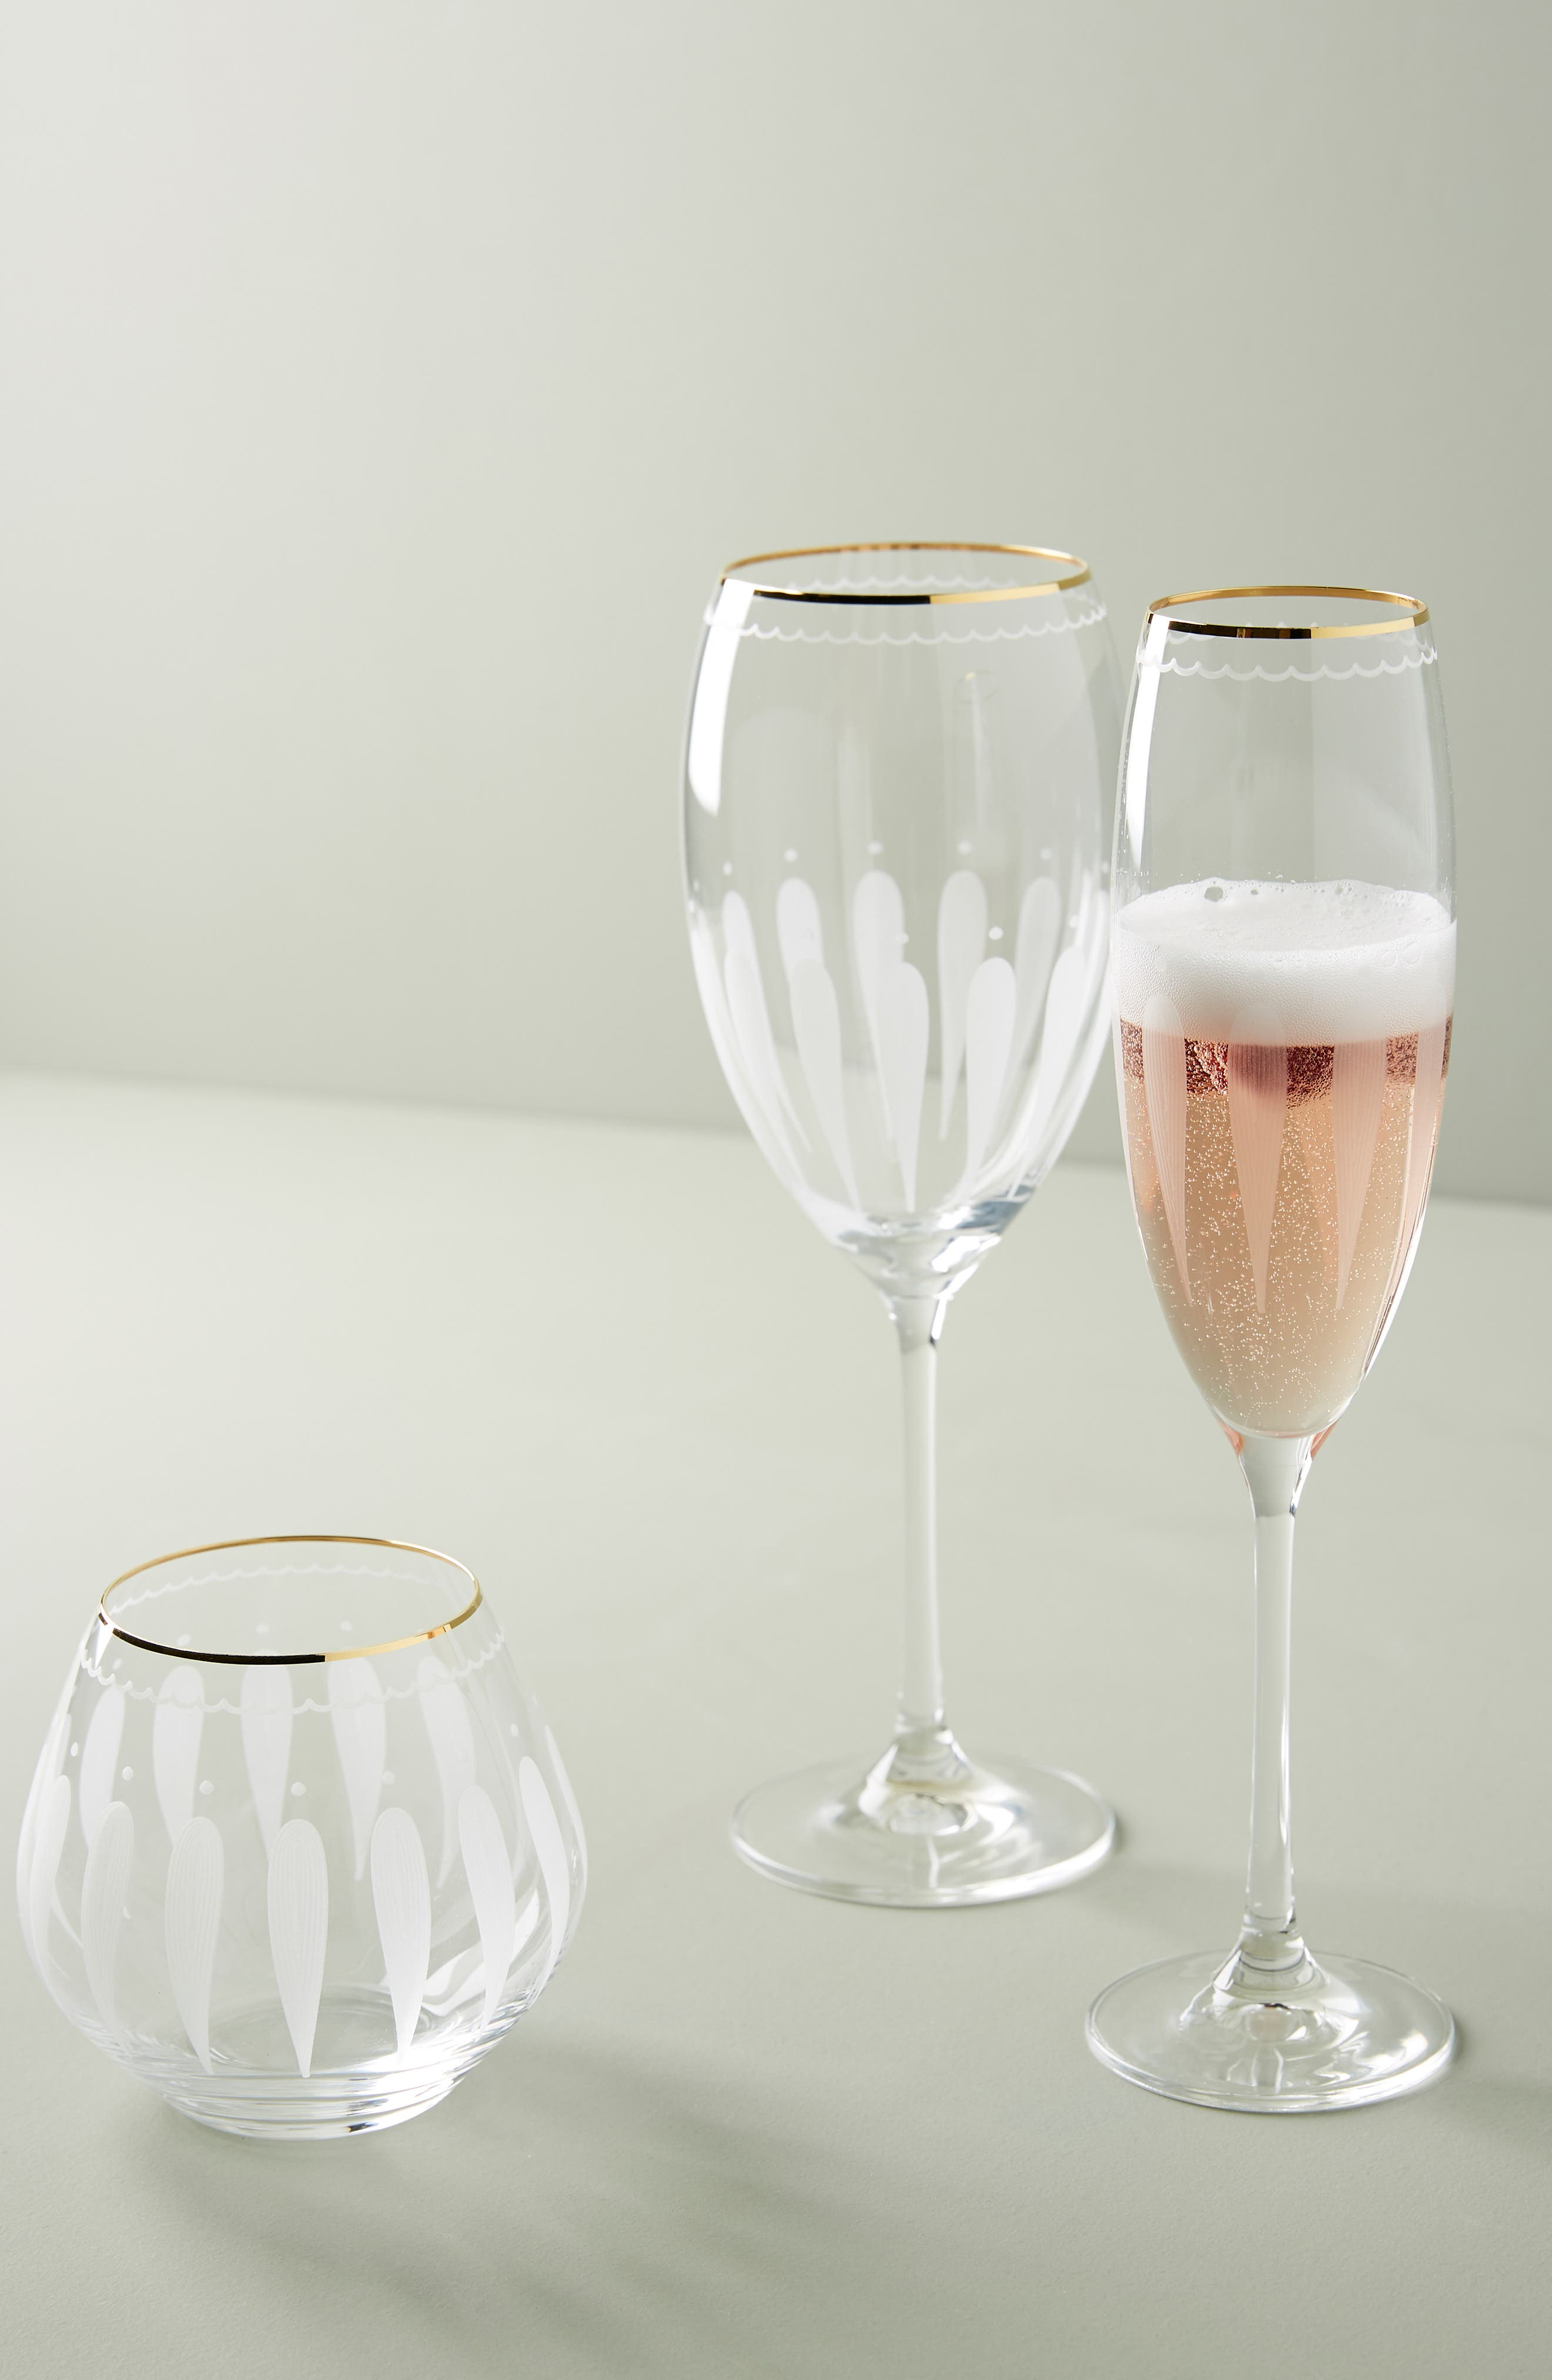 Odele Set of 4 Wine Glasses,                             Alternate thumbnail 3, color,                             CLEAR